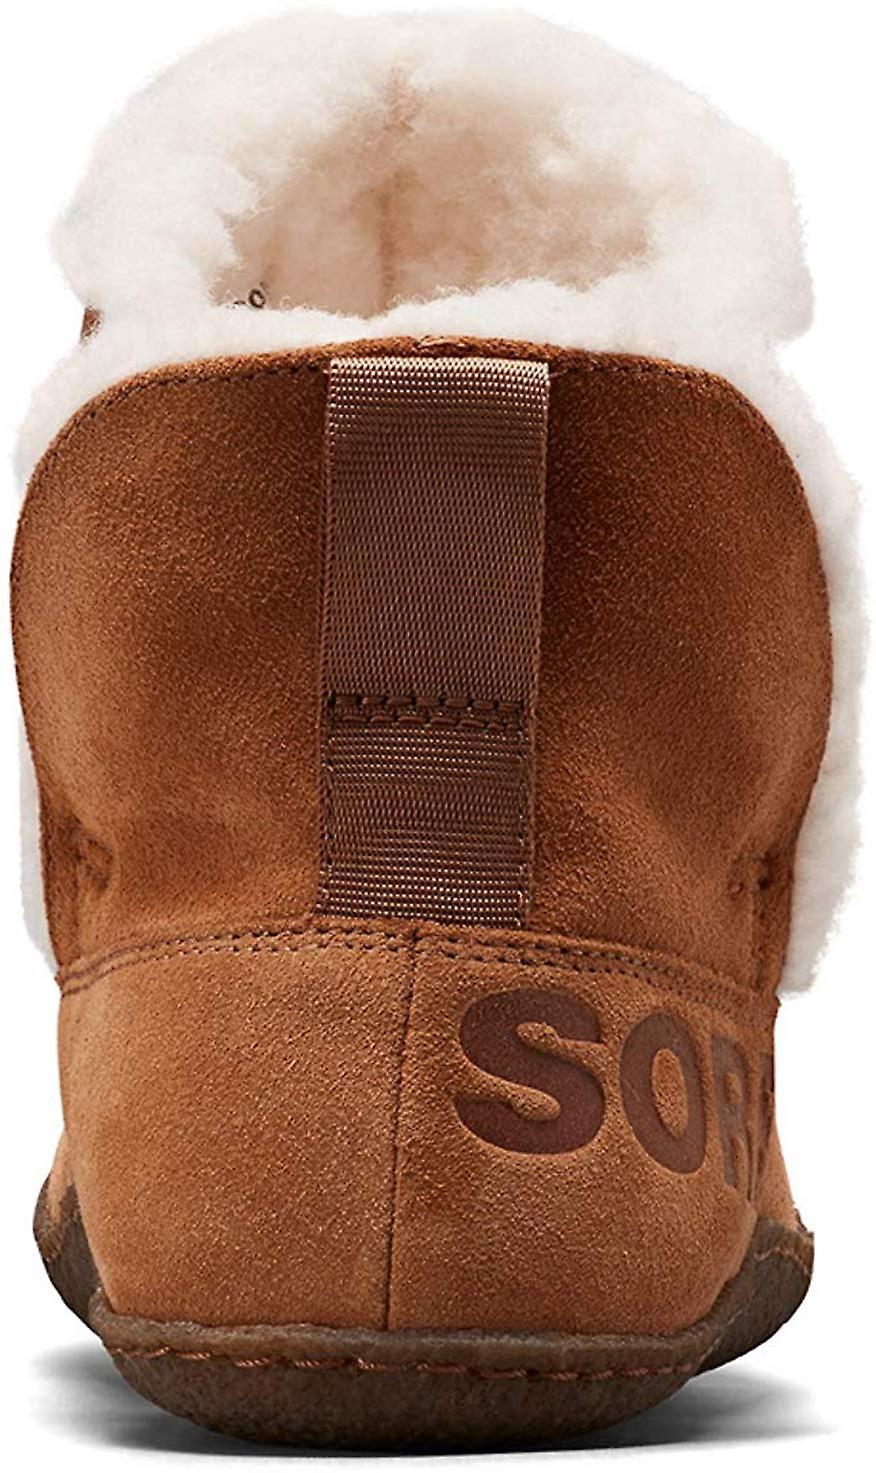 Sorel Women's Shoes Nakiska Faux Fur Closed Toe Pull On Slippers zwfIE